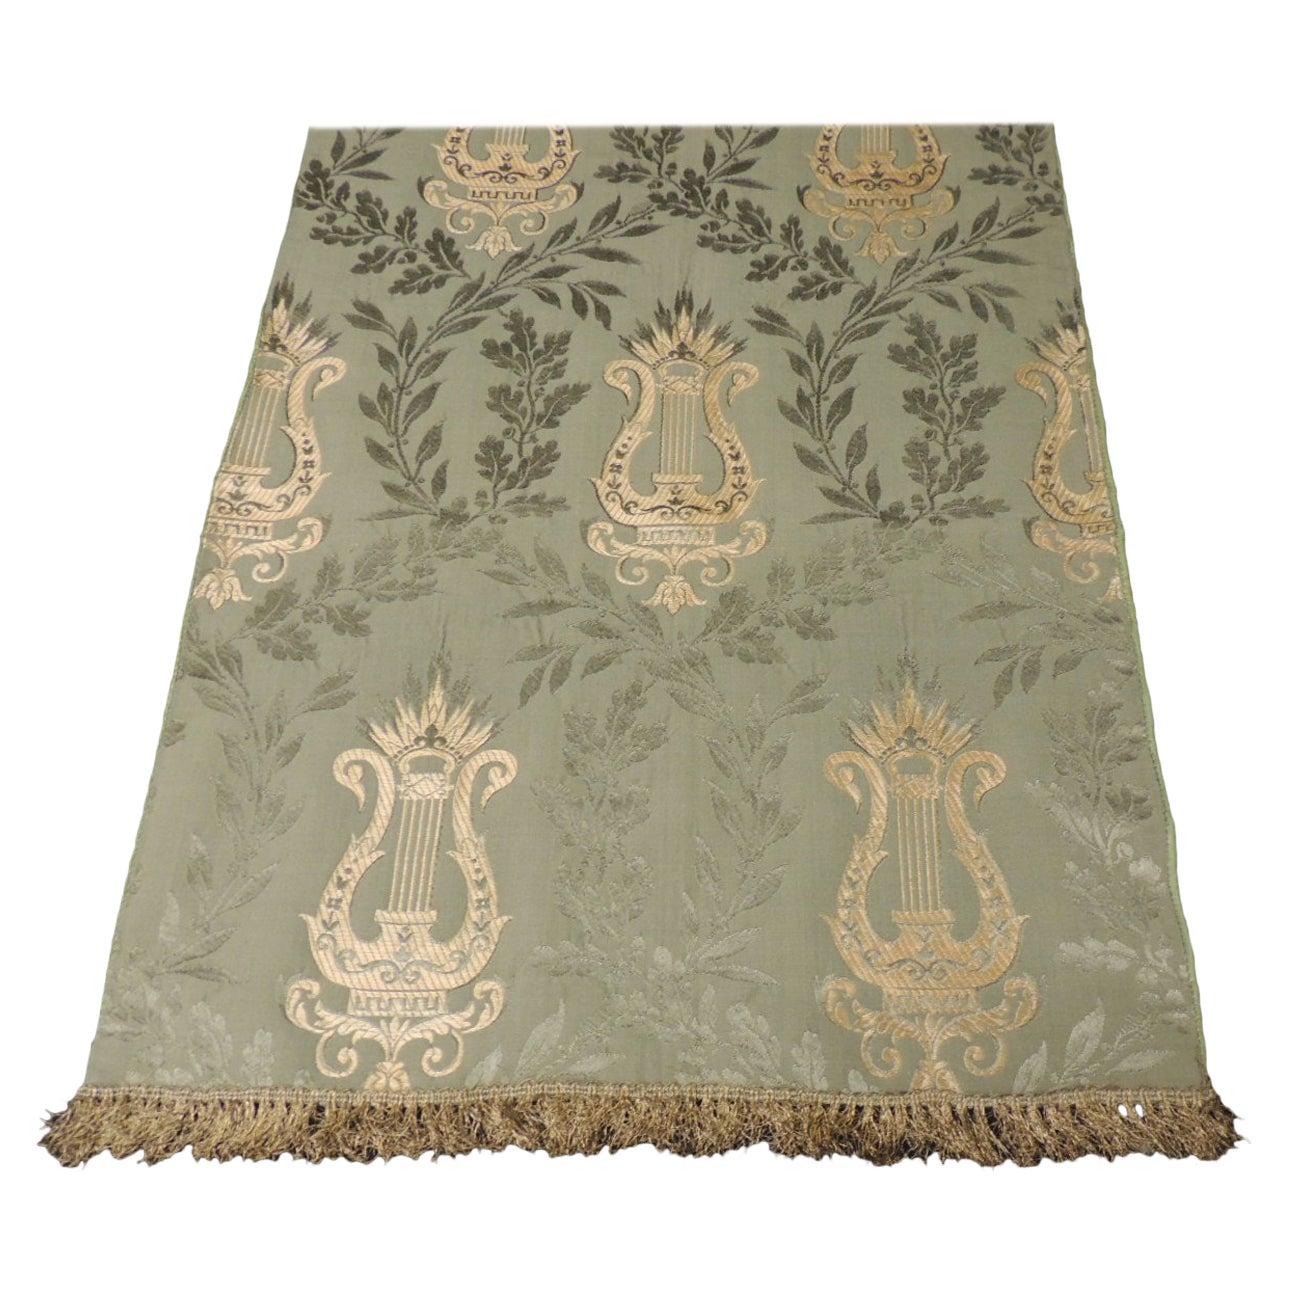 Antique Italian Green and Gold Silk Brocade Textile